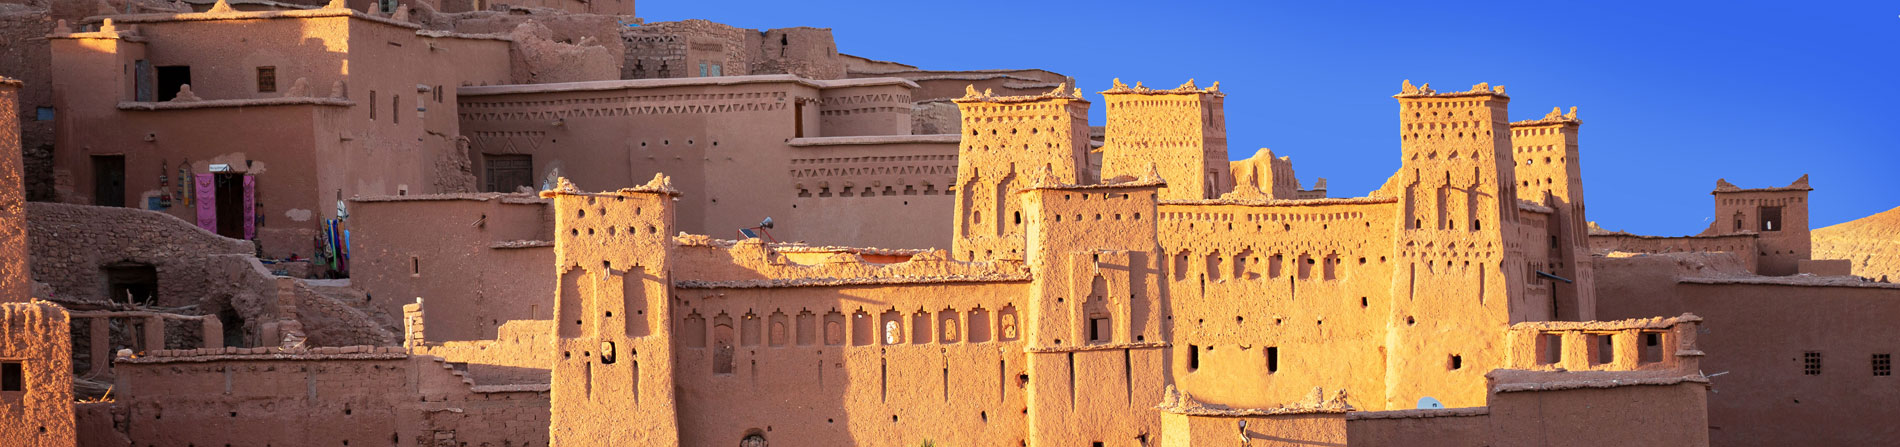 2021 03 06 Marokko 04